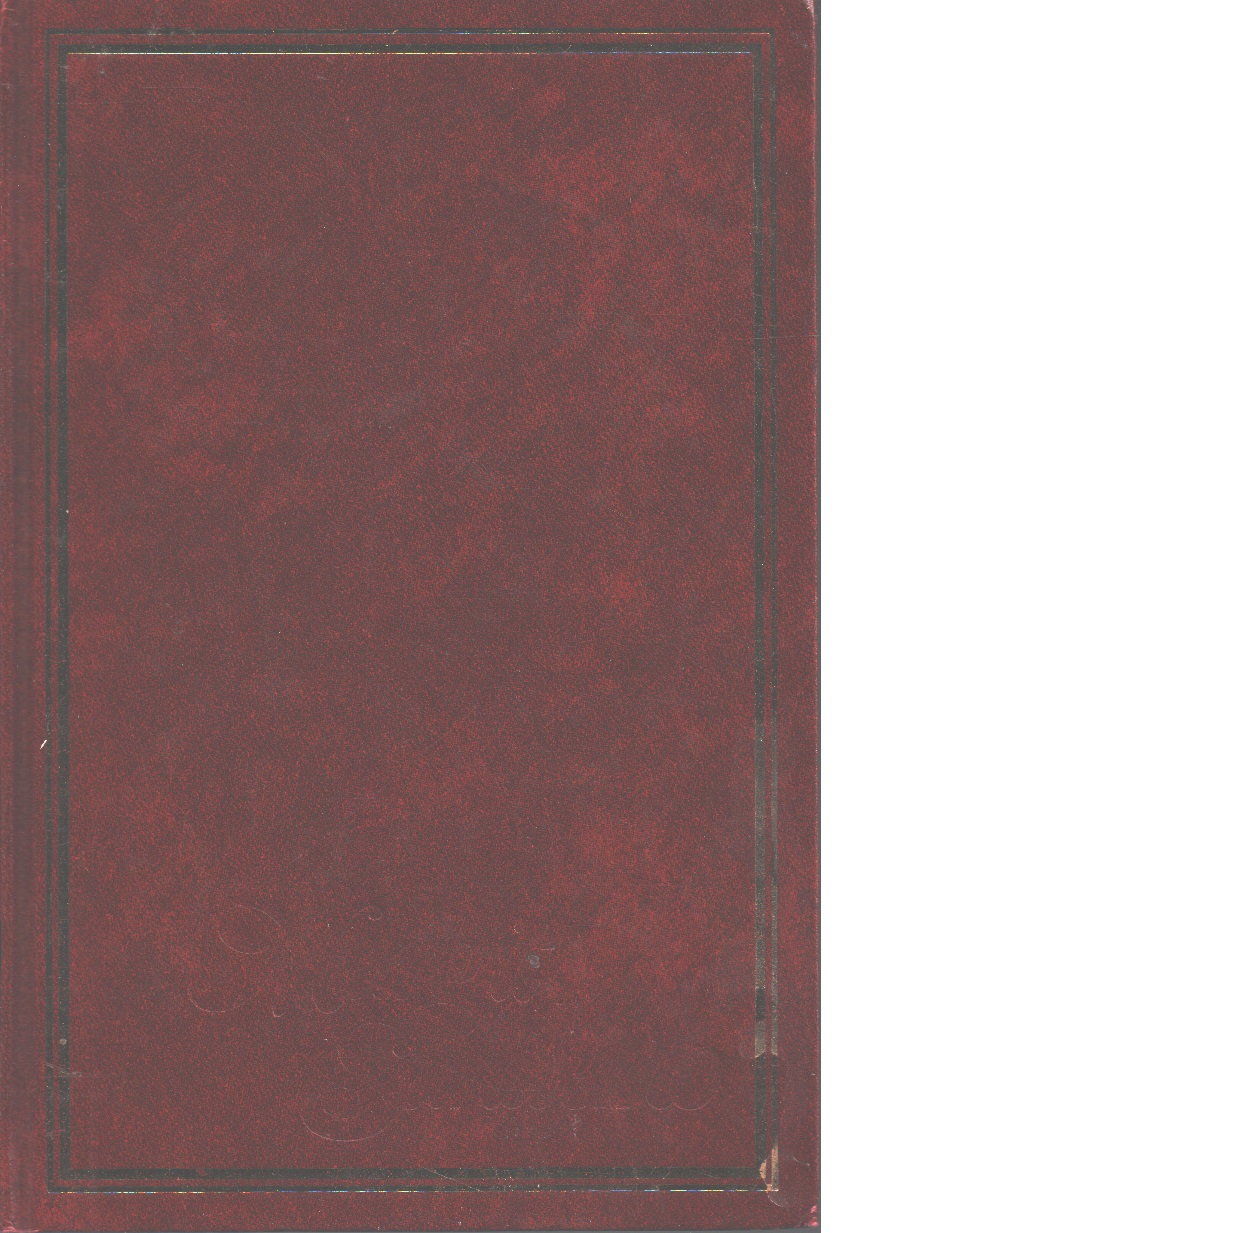 Feber i blodet : Sagan om Isfolket nr. 12 - Sandemo, Margit